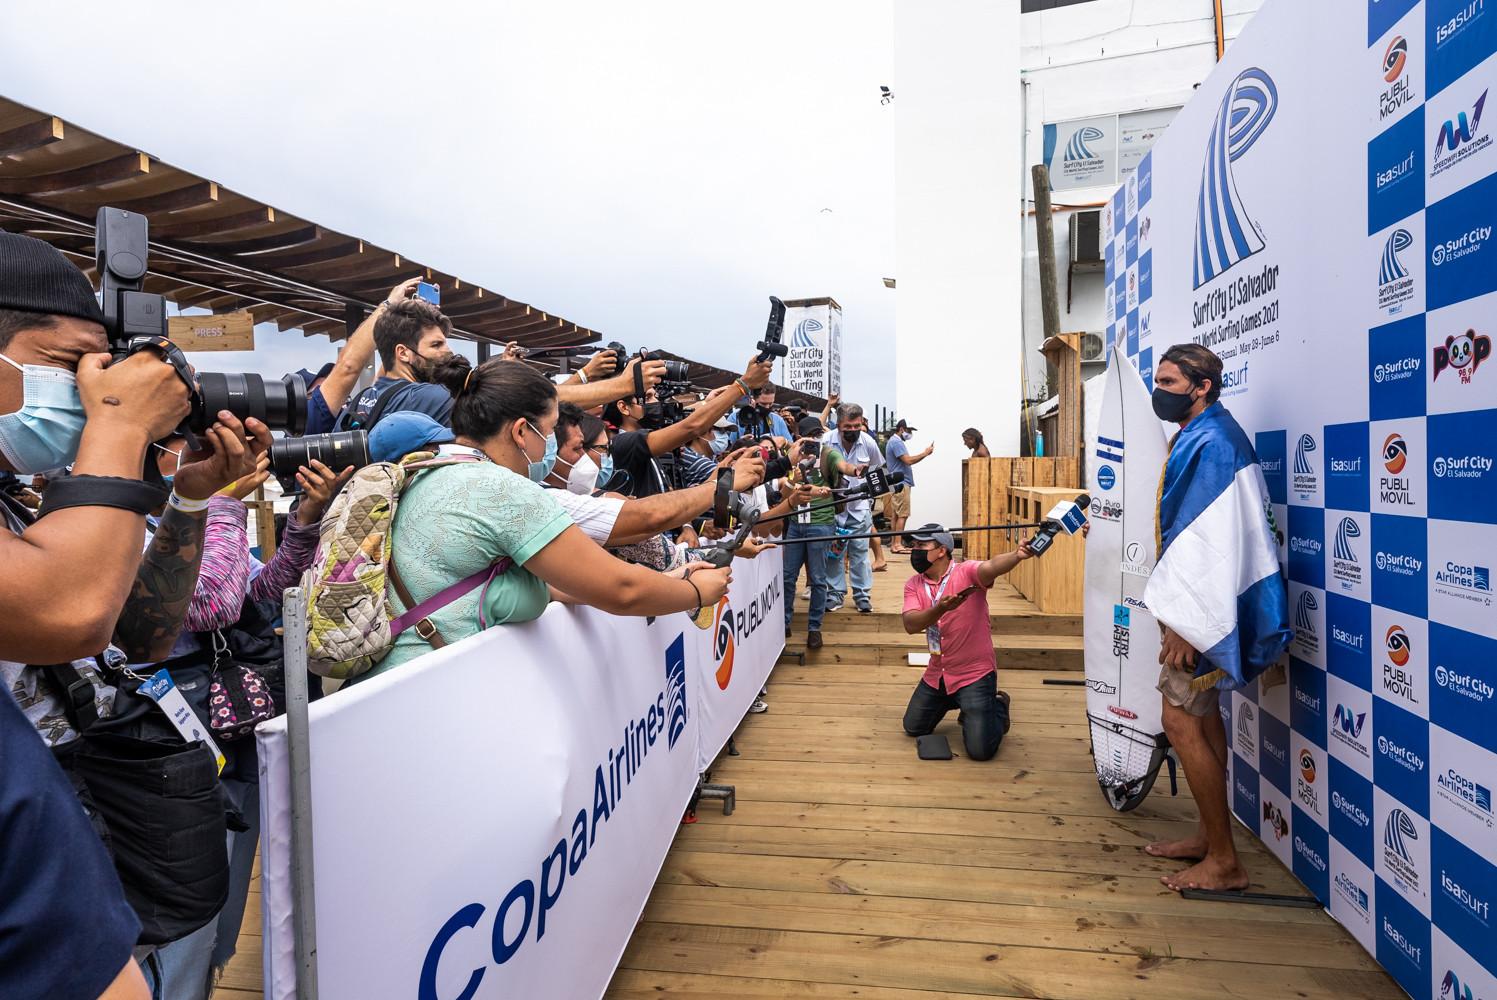 Home surfer Bryan Perez, representing El Salvador, speaks to the media after winning his repechage heat ©ISA/Sean Evans